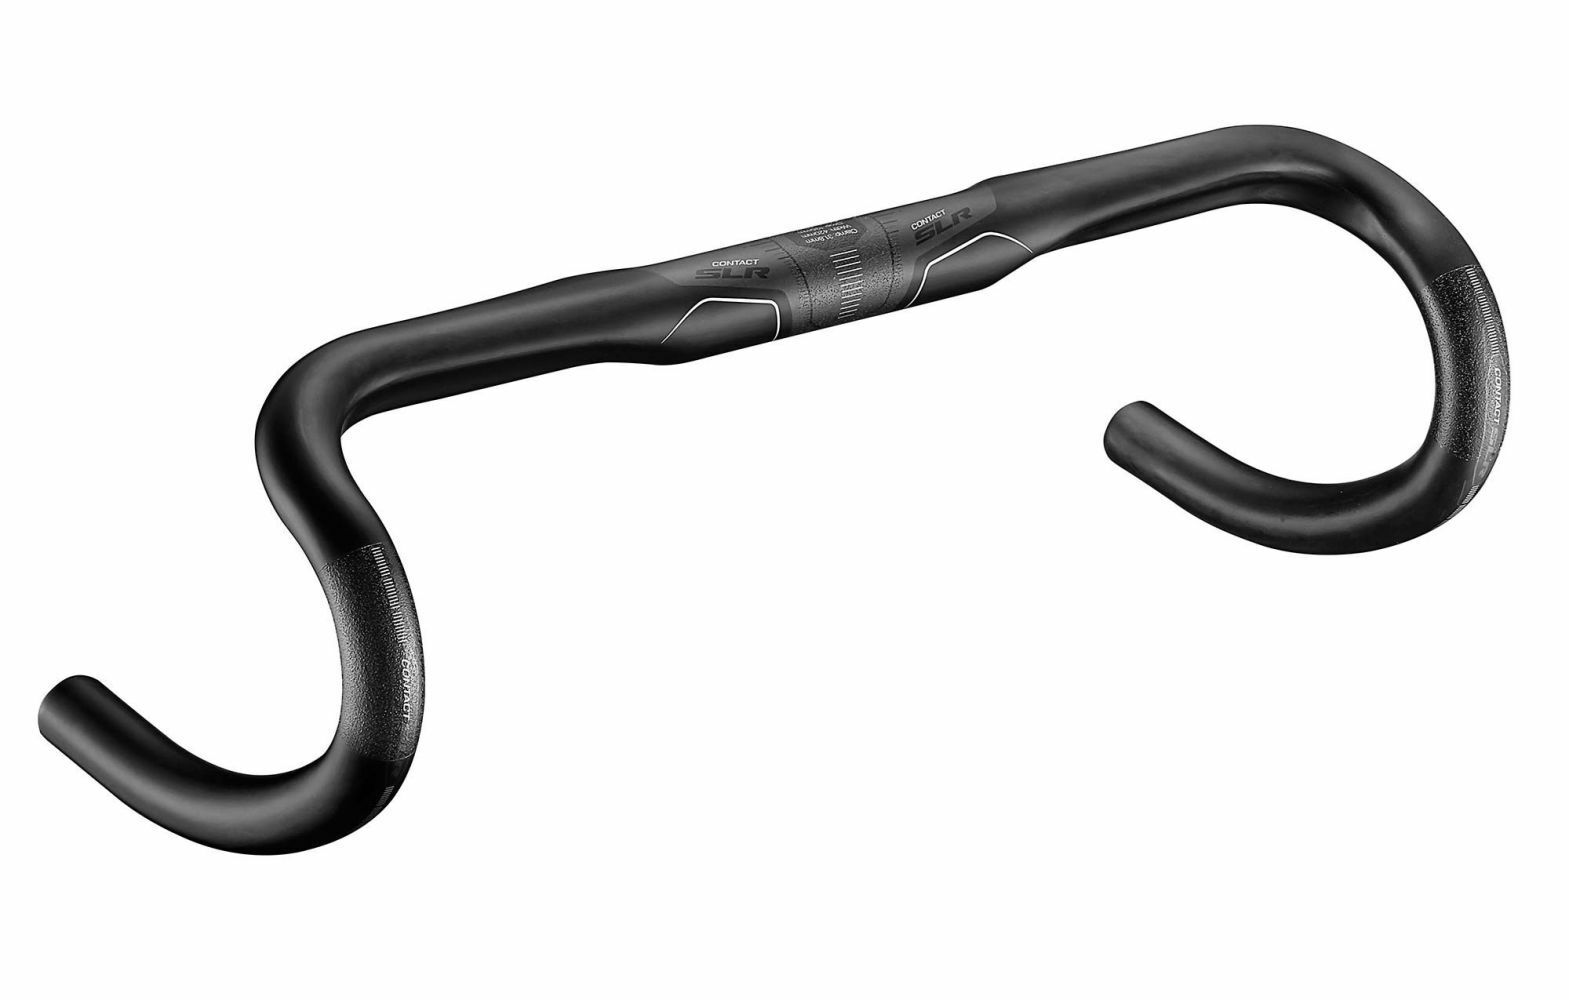 GIANT KONTAKT SLR Compact Carbon HANDLEBAR W im Kombibereich 65533;Objekt65533; 40cm 400mm